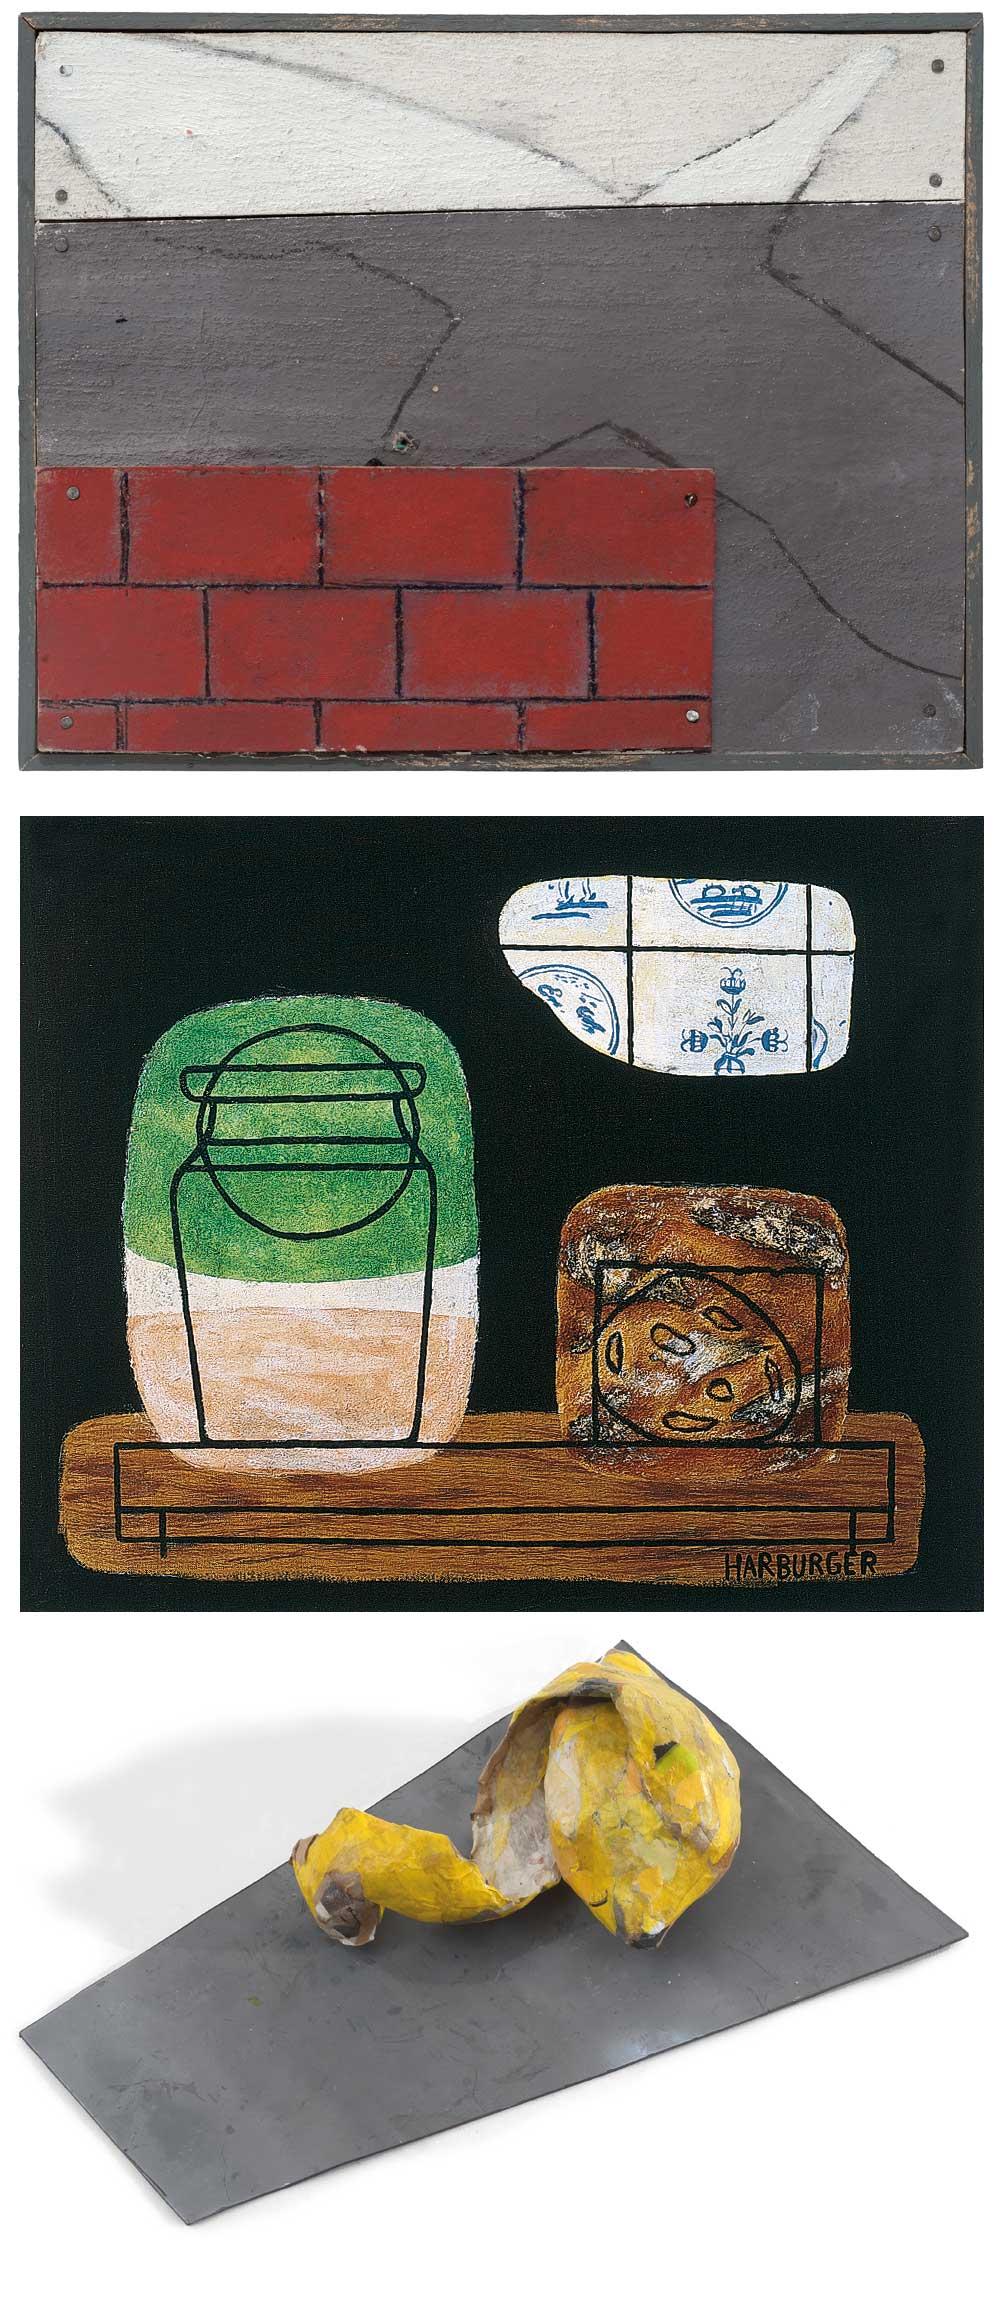 Exposition Pierre Buraglio - Francis Harburger - Claude Buraglio (Peintures et installations)